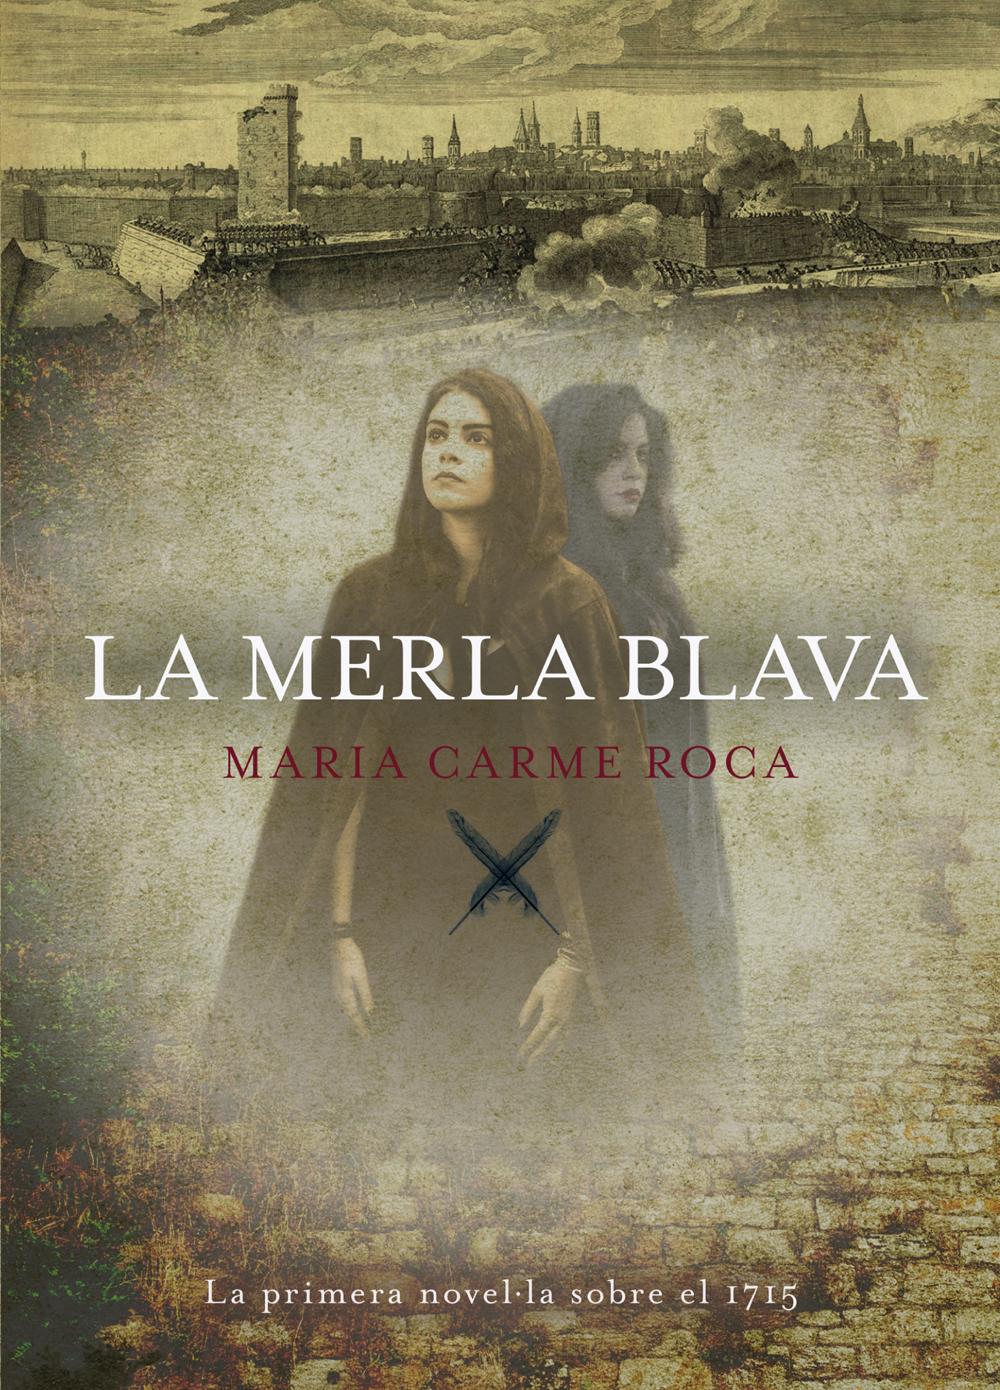 http://labibliotecadebella.blogspot.com.es/2015/07/la-merla-blava-maria-carme-roca.html